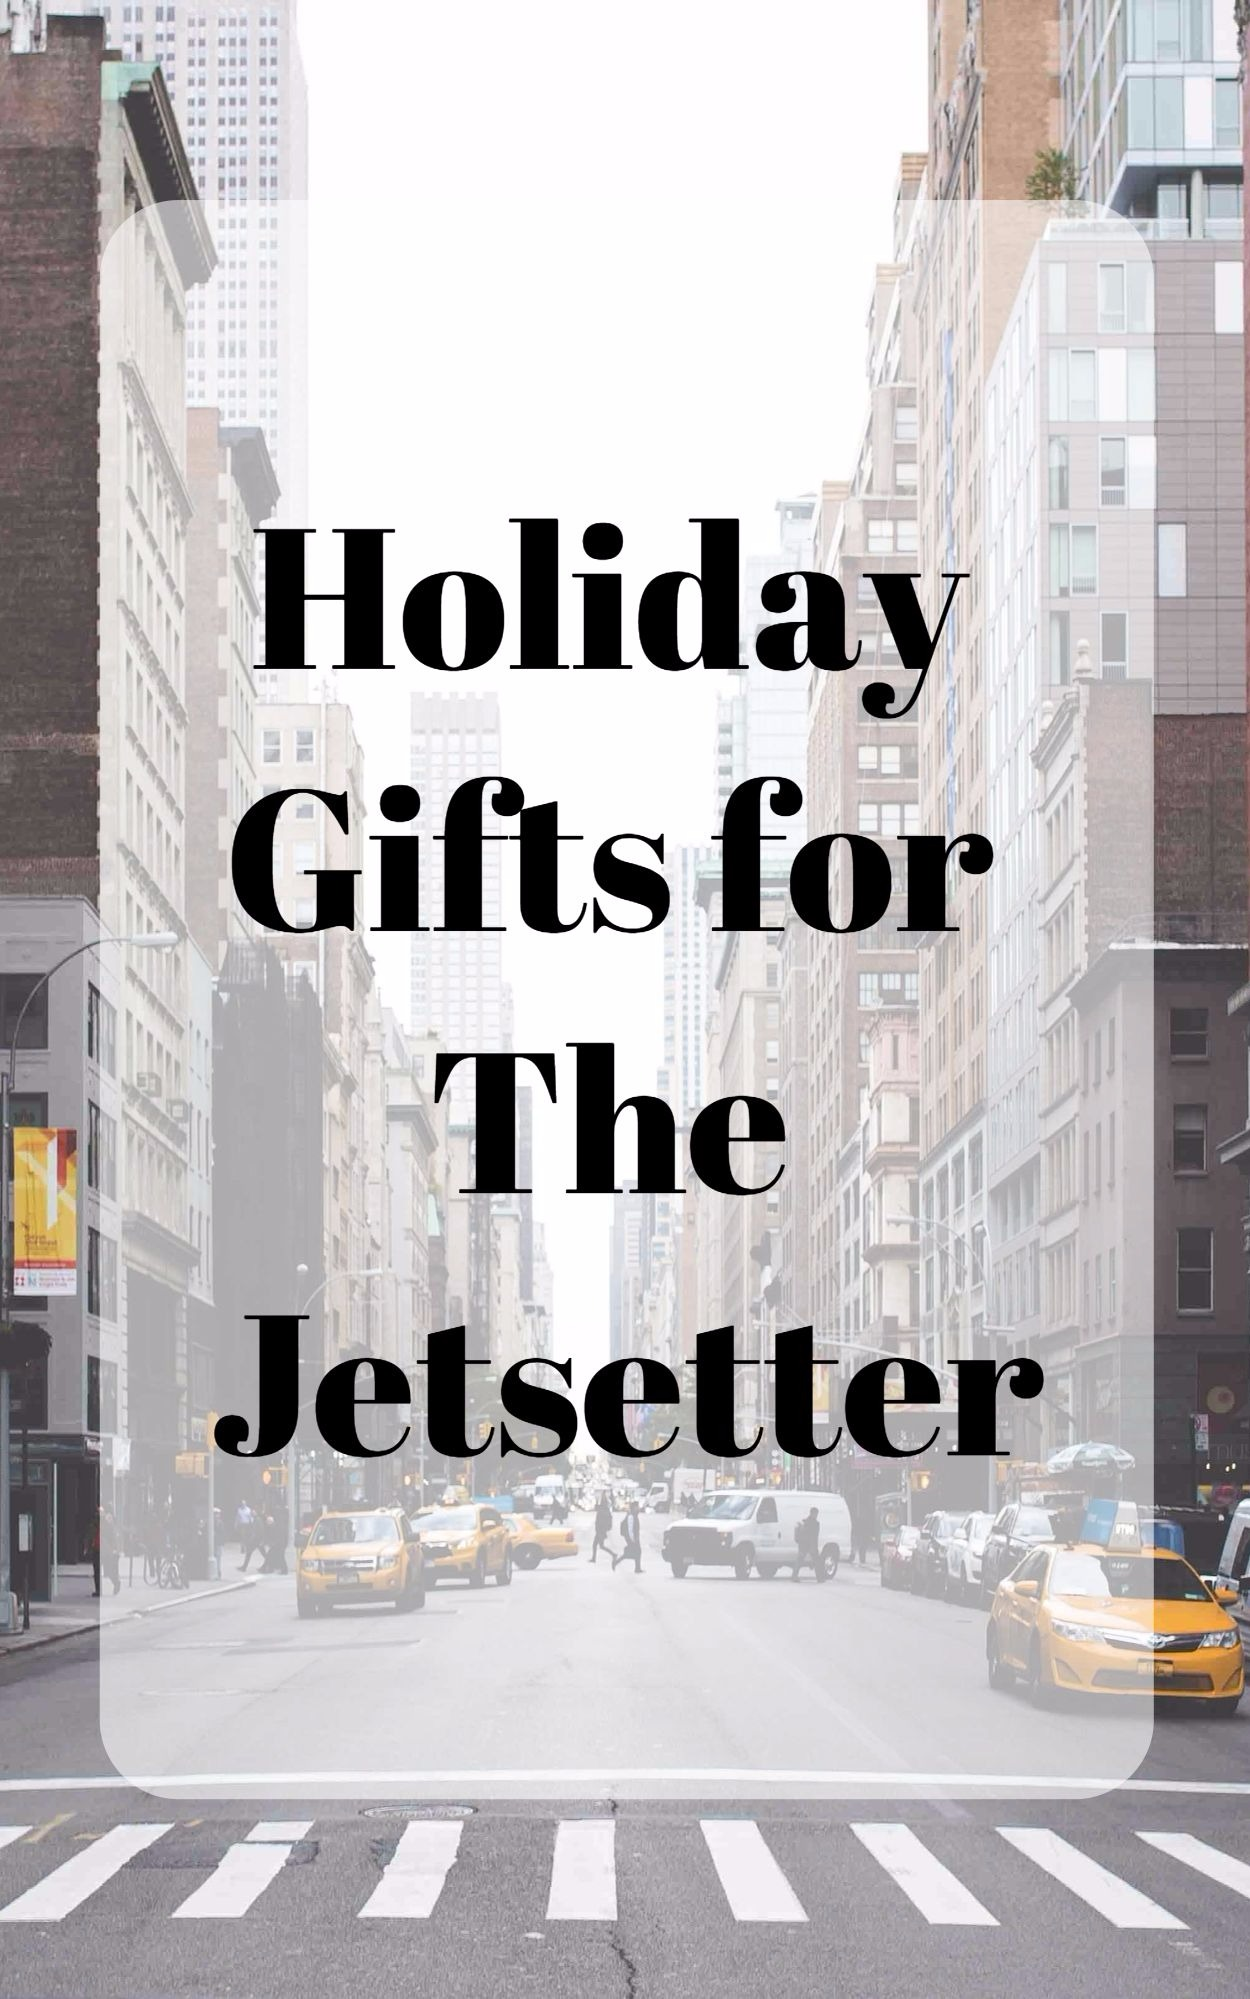 holiday gift ideas for the jetsetter girl. Chritmas gift guide for the girl who loves to travel